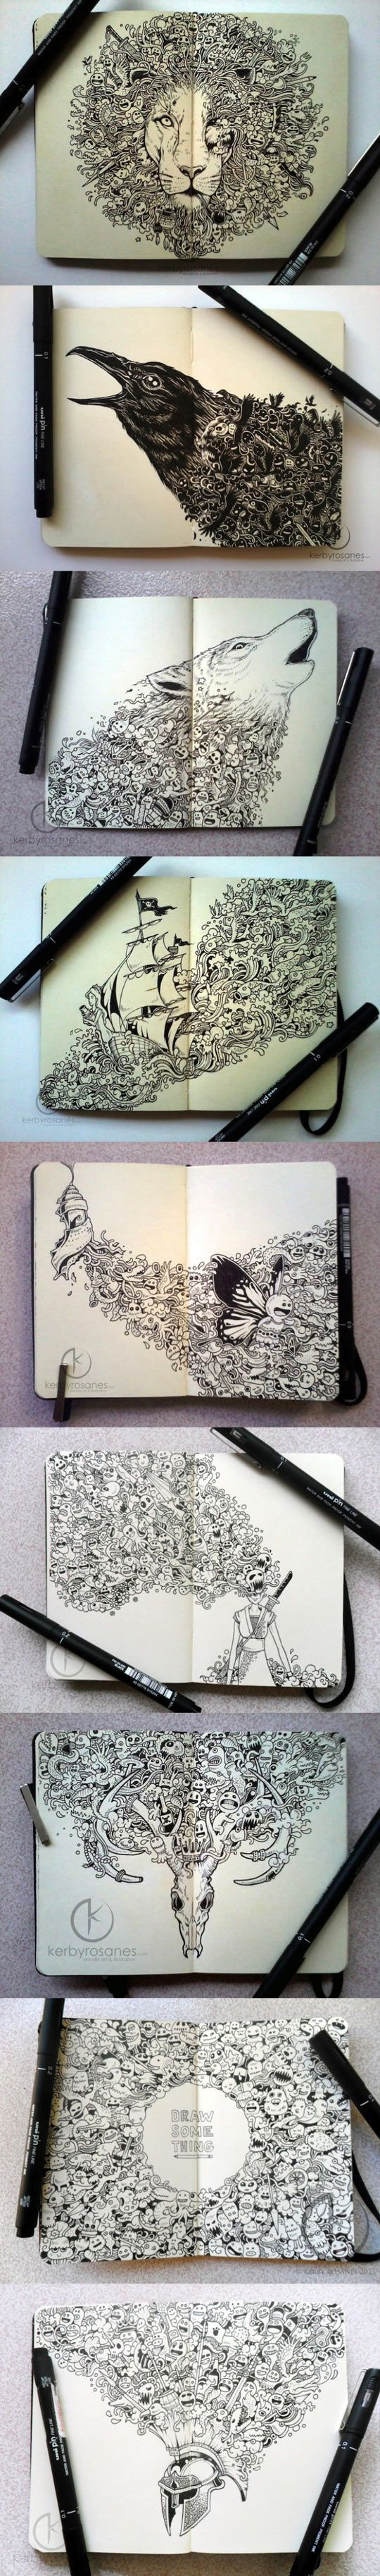 Incredible Moleskine drawings… #doodles #art #drawing